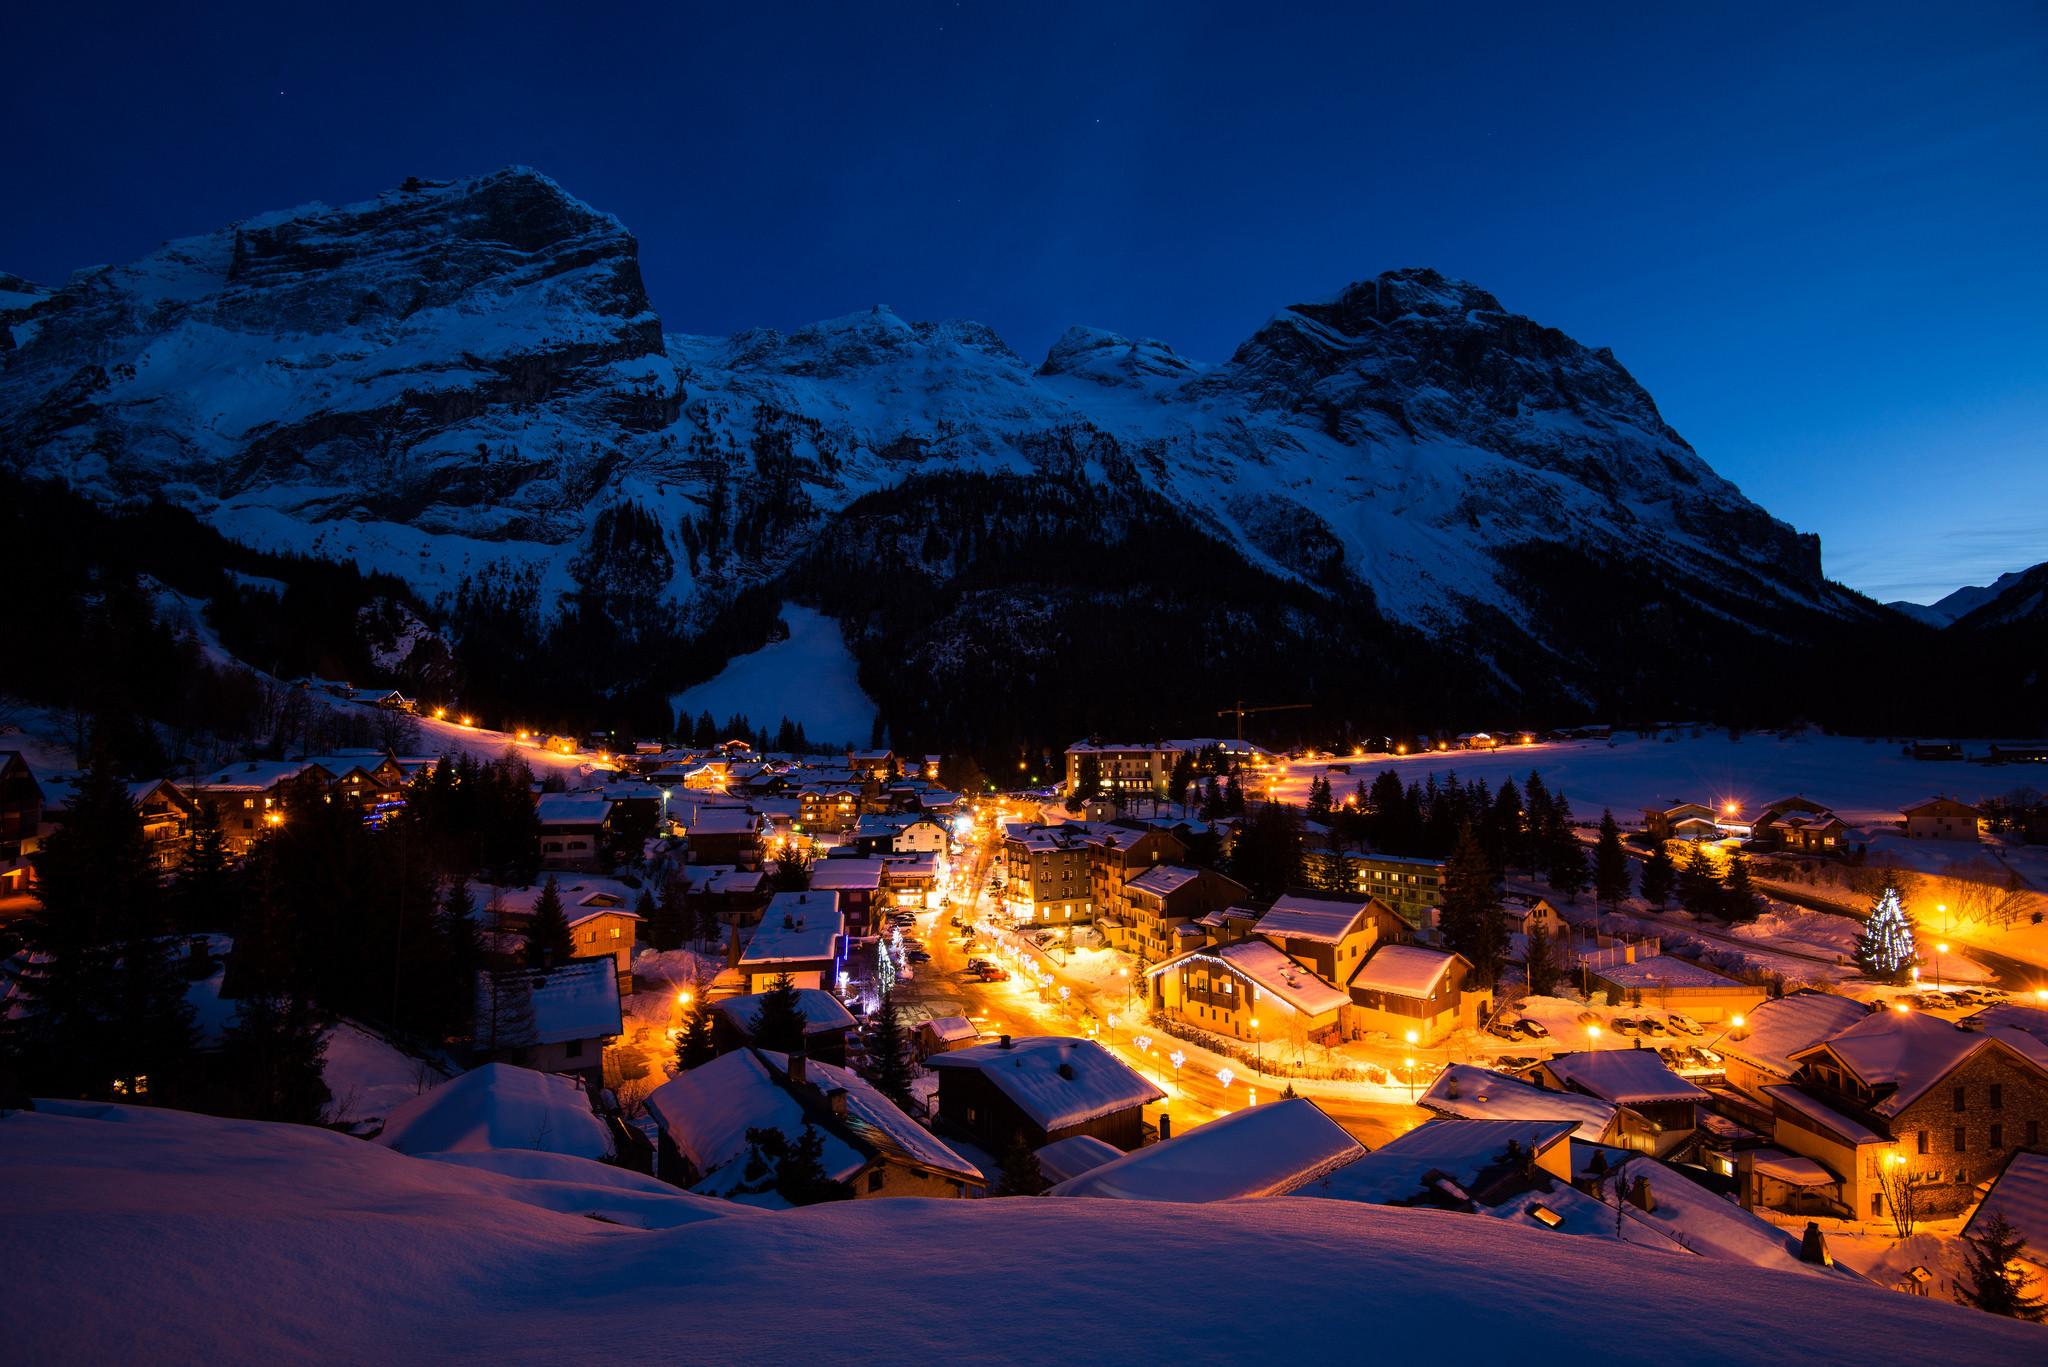 Winter Night Desktop Background